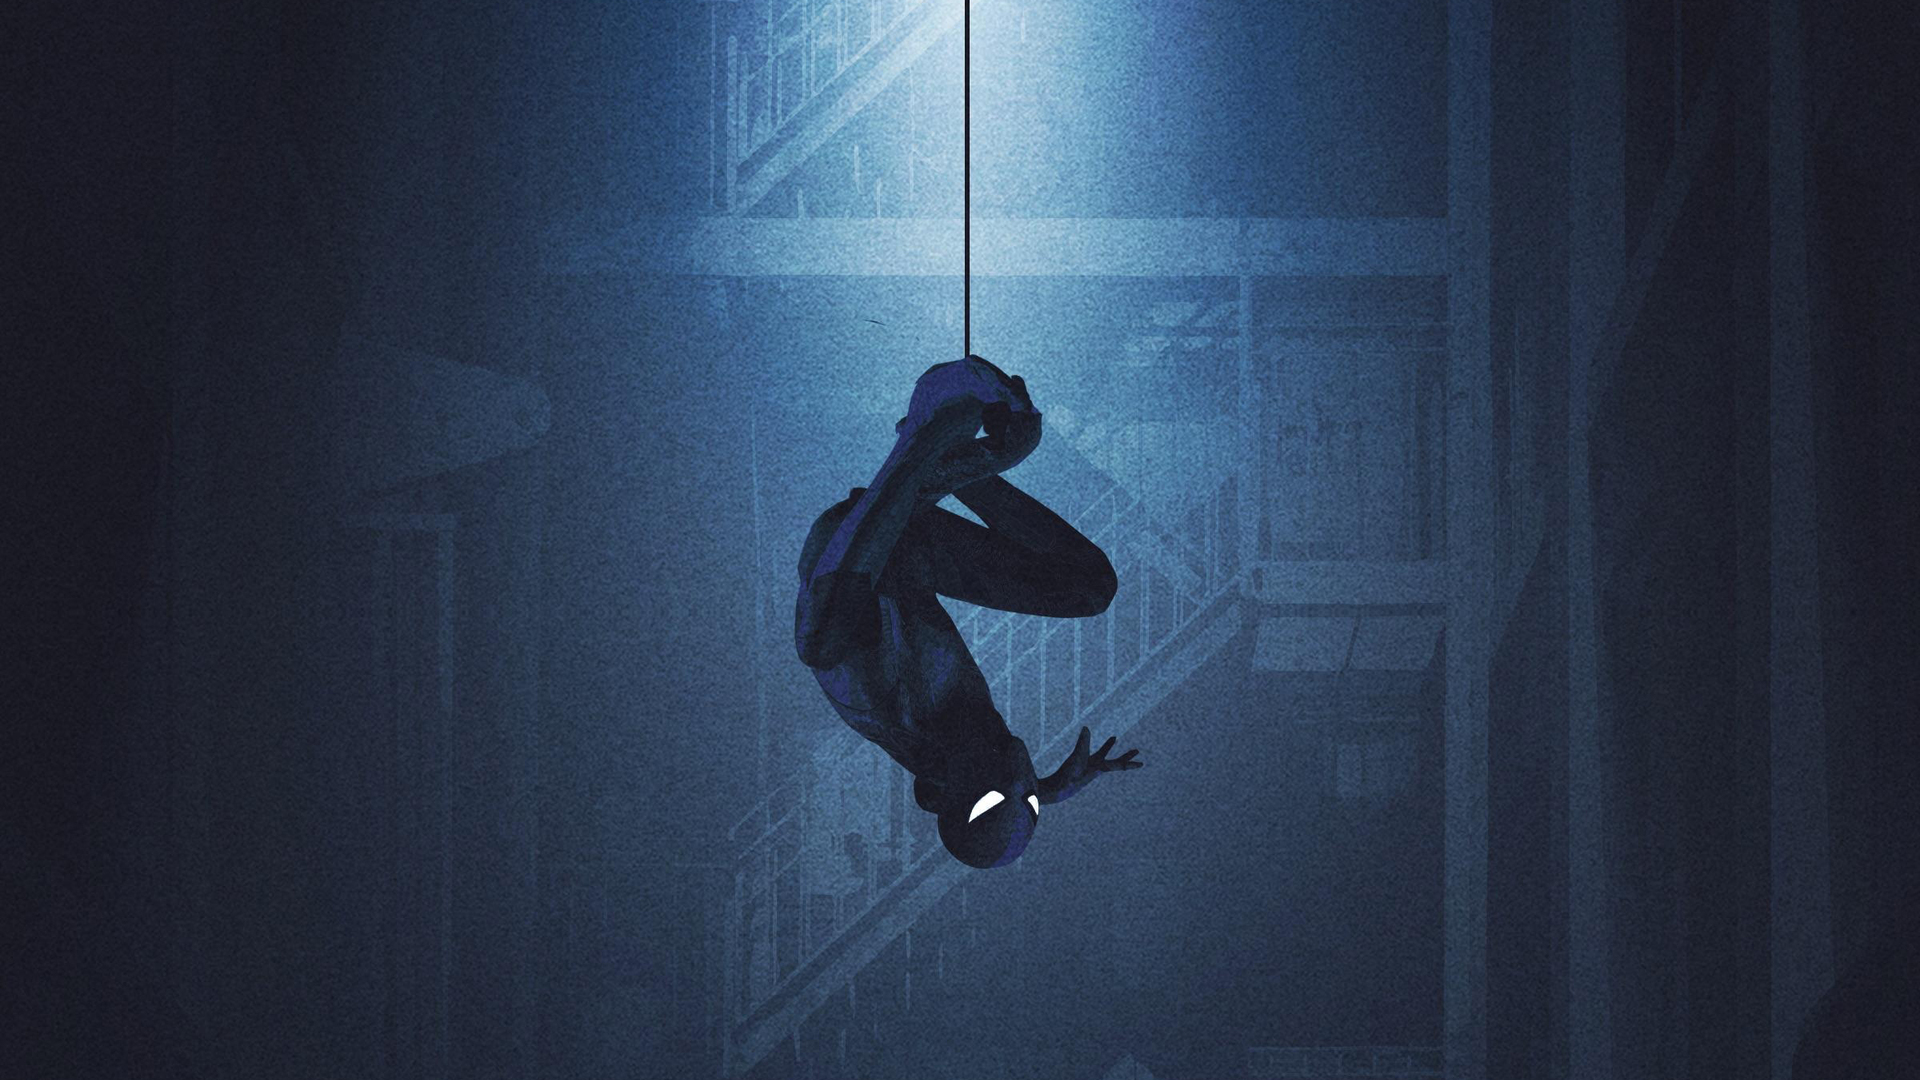 1920X1080 Spiderman Black Suit Laptop Full Hd 1080P Hd 4K -5555